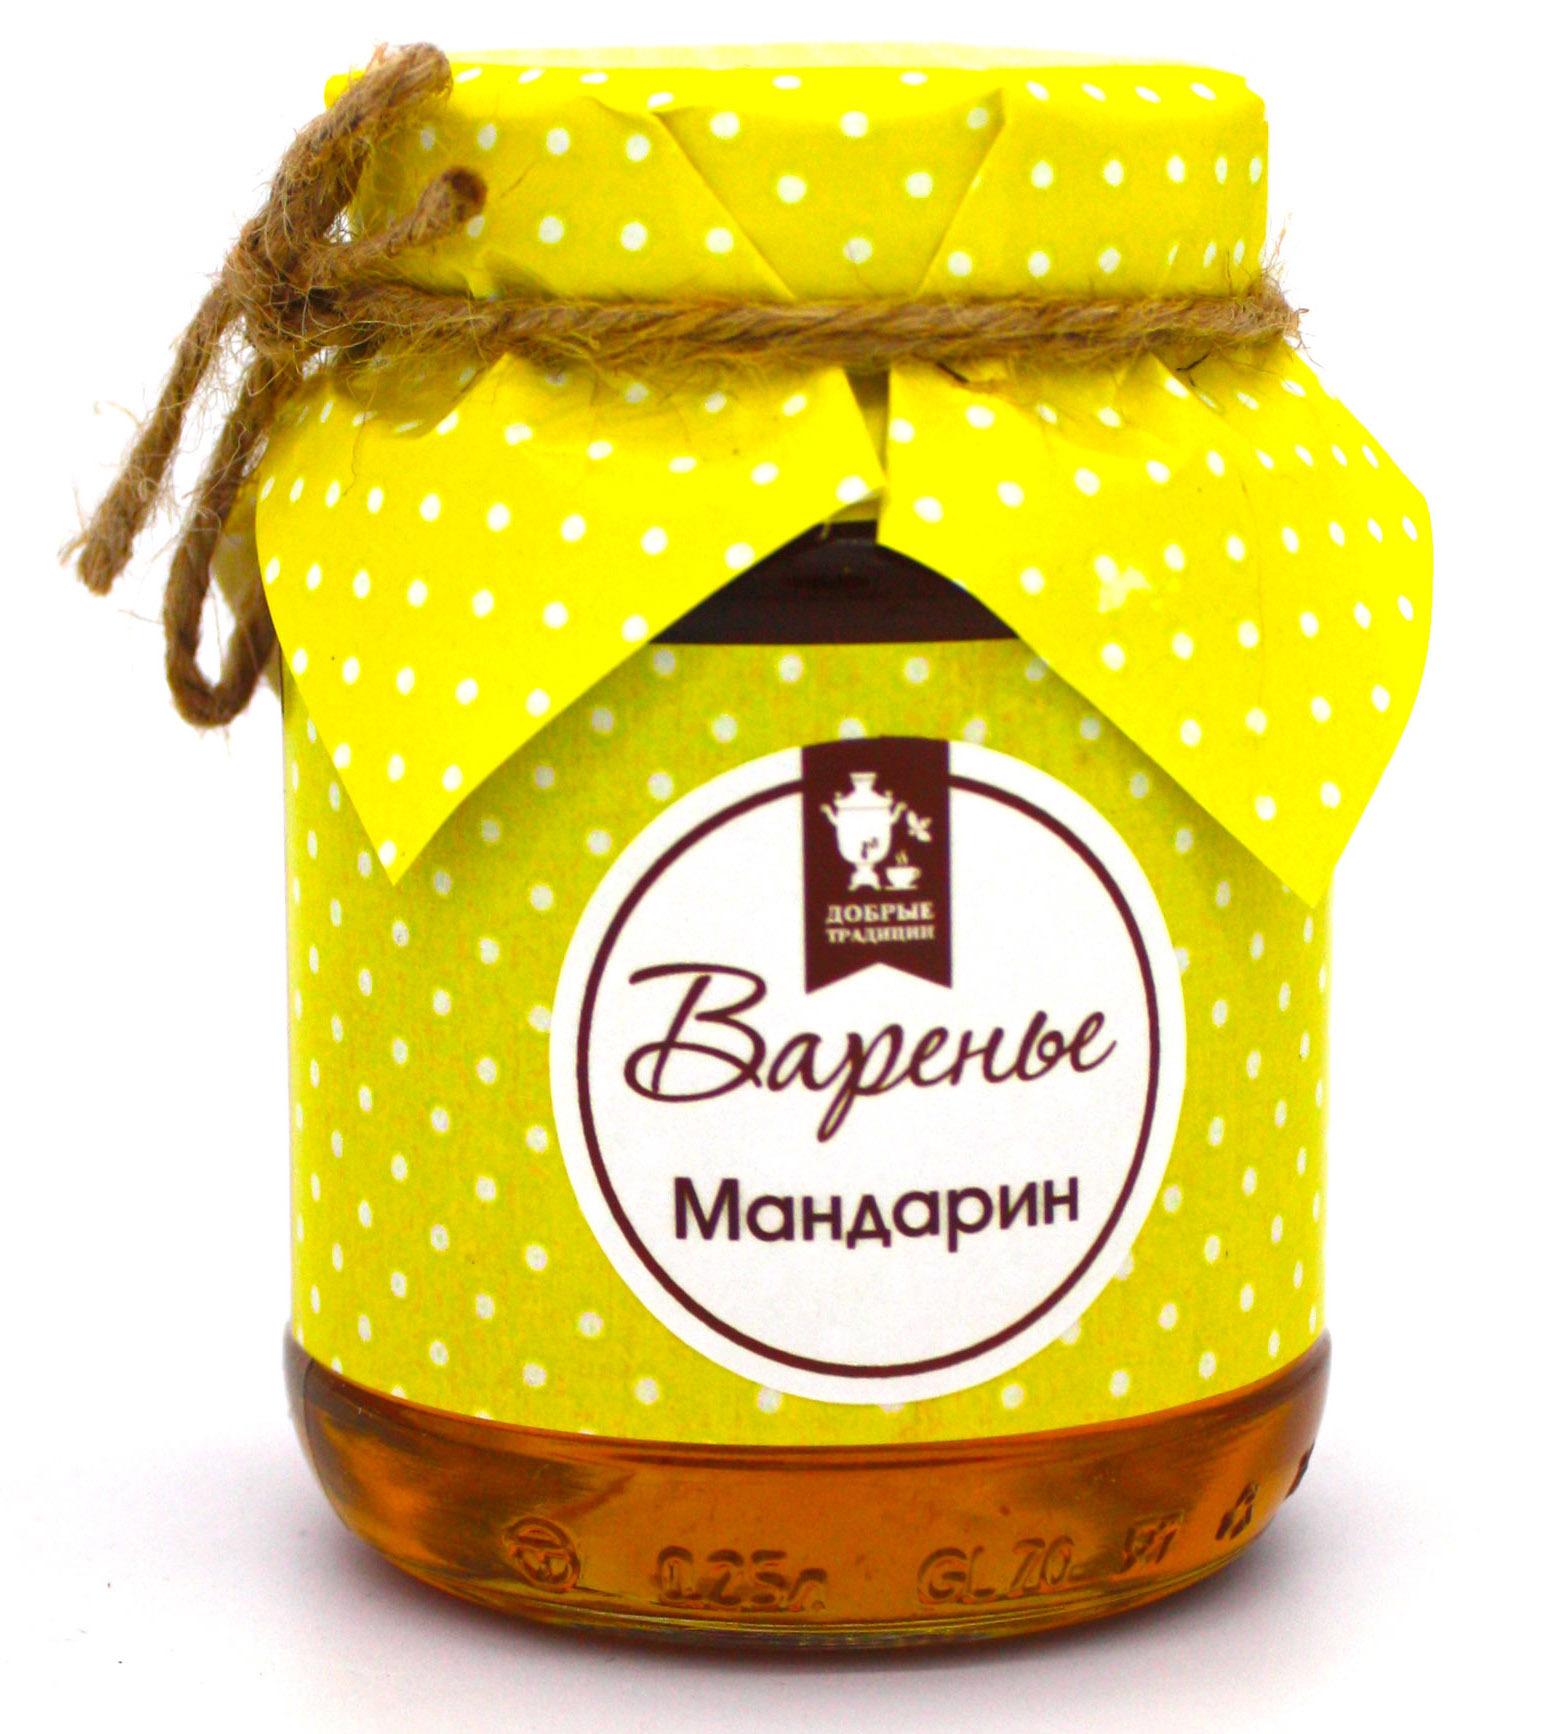 "Варенье и мед Варенье ""Мандарин"" Добрые традиции, 375 г import_files_07_07e47f73cbd111e8a99c484d7ecee297_72901ebf543d11e9a9ac484d7ecee297.jpg"